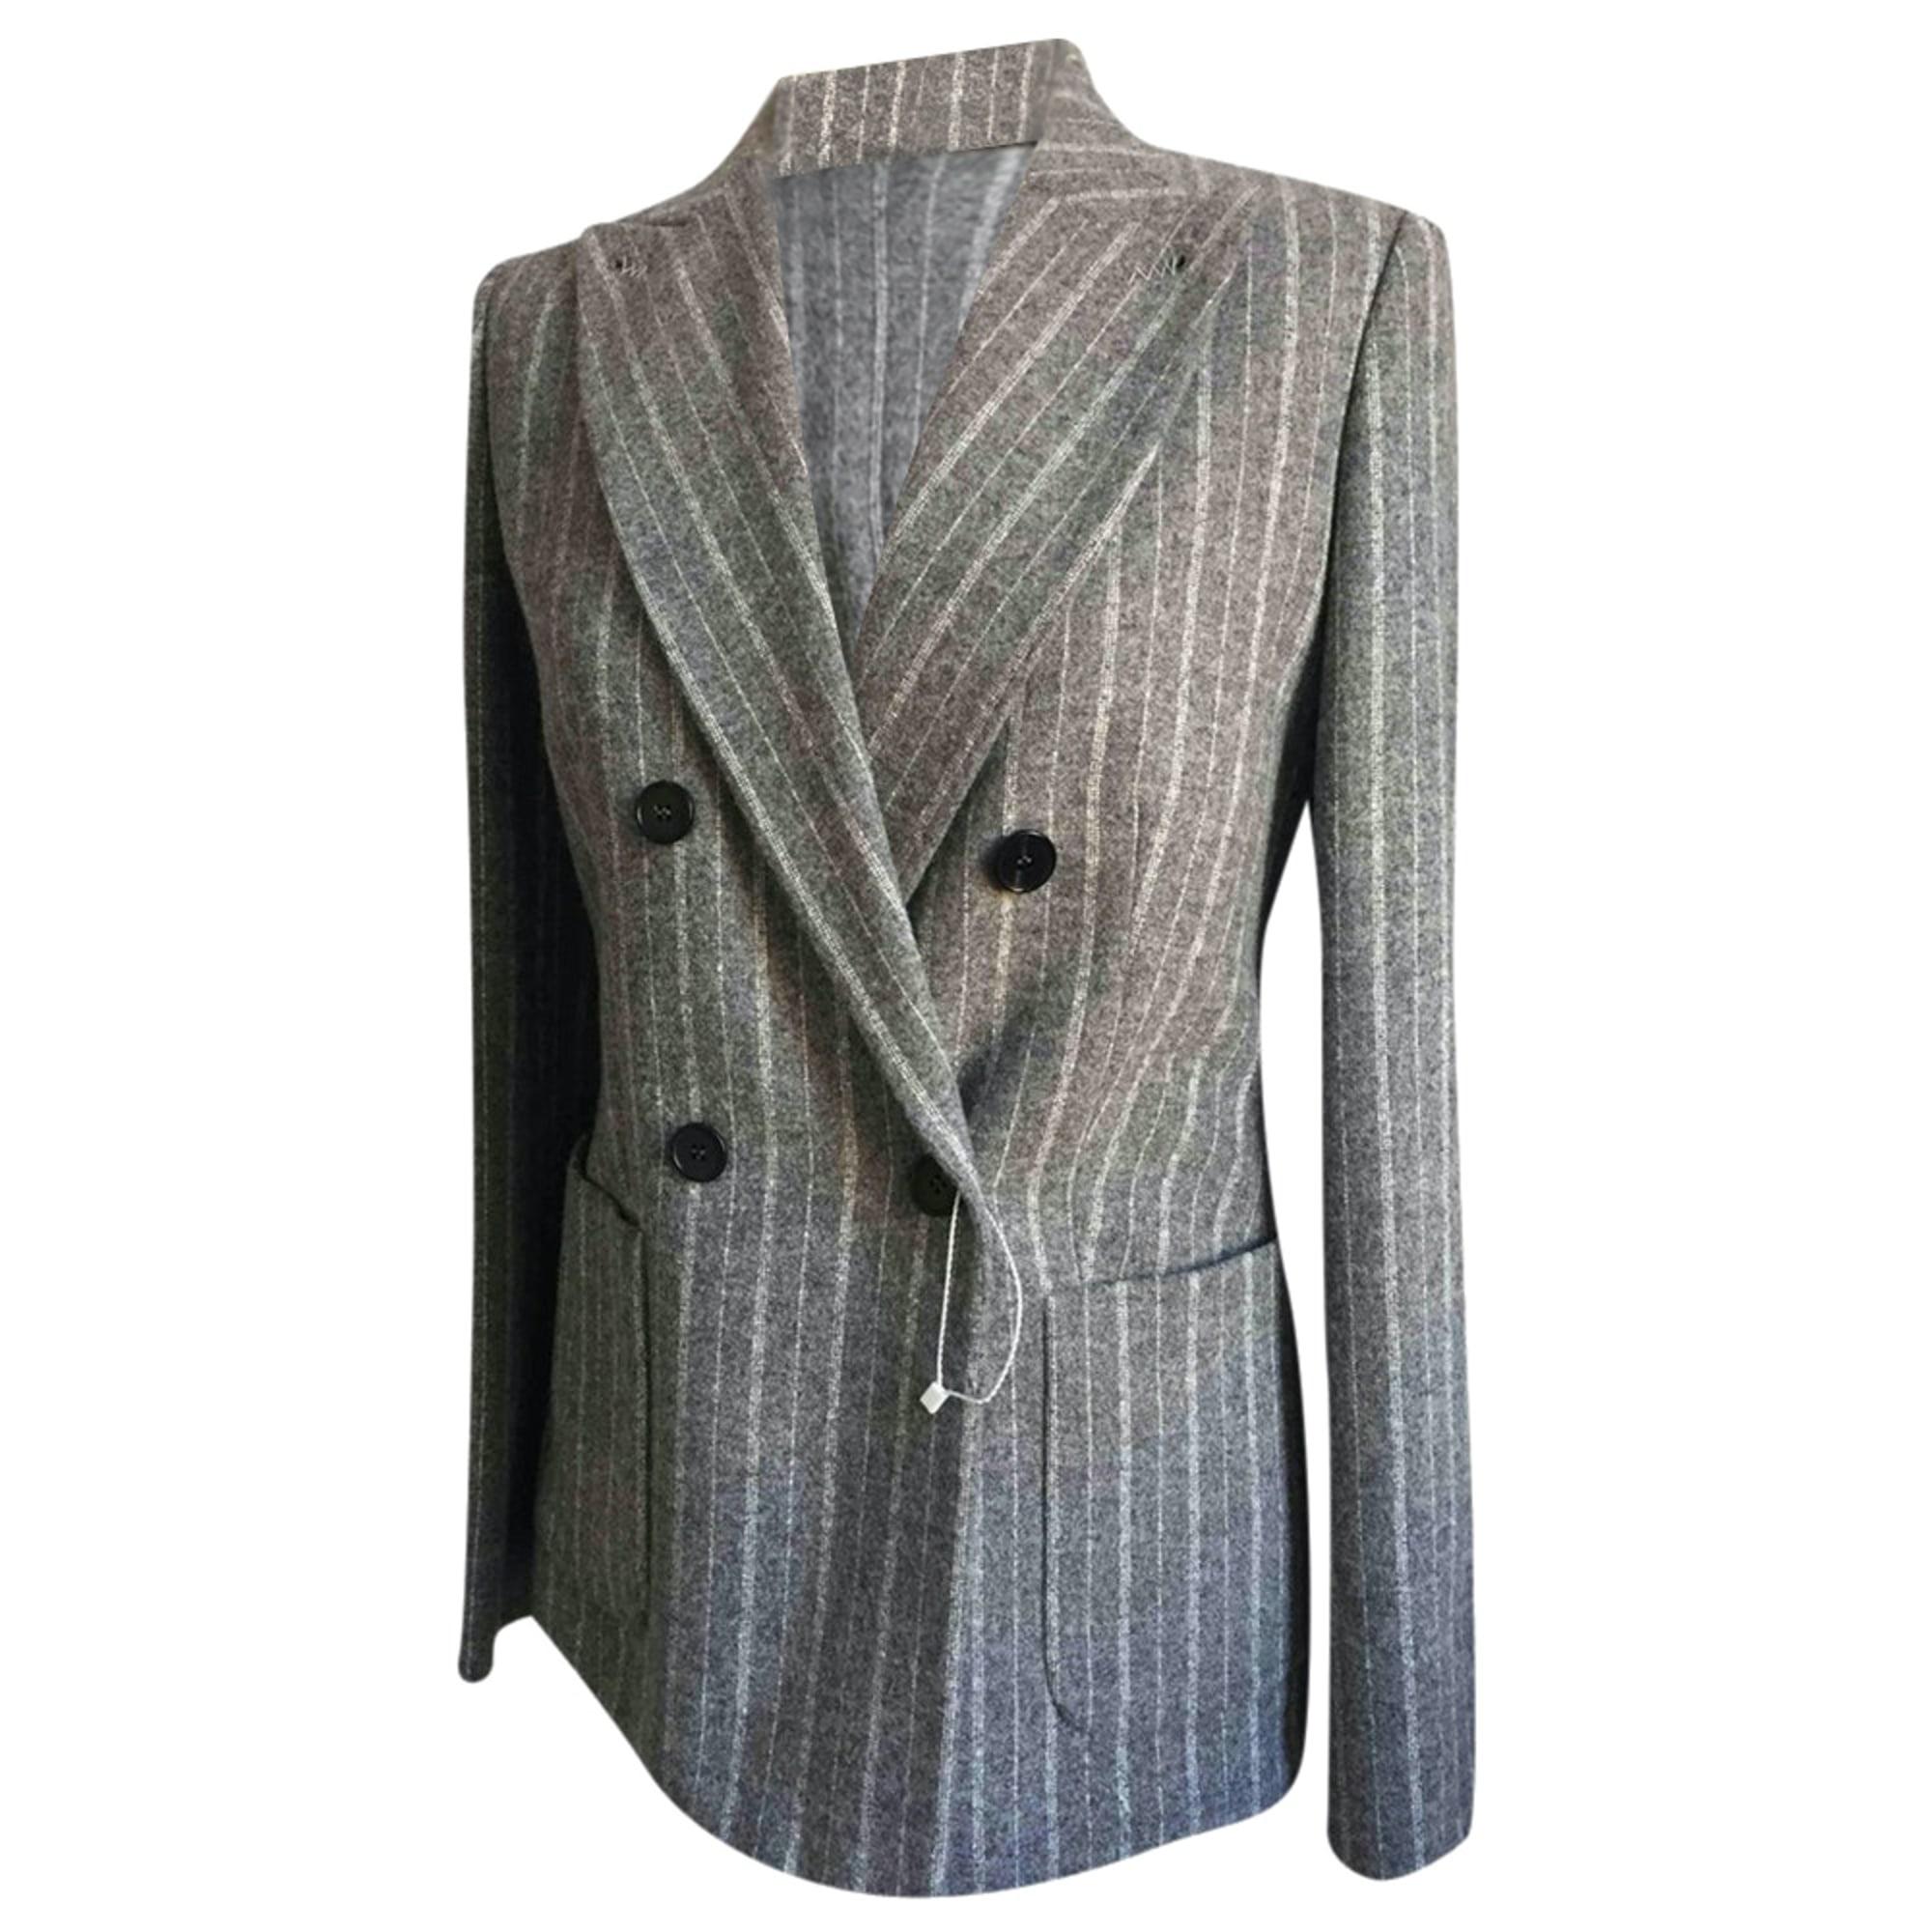 Blazer, veste tailleur MAX MARA Gris, anthracite